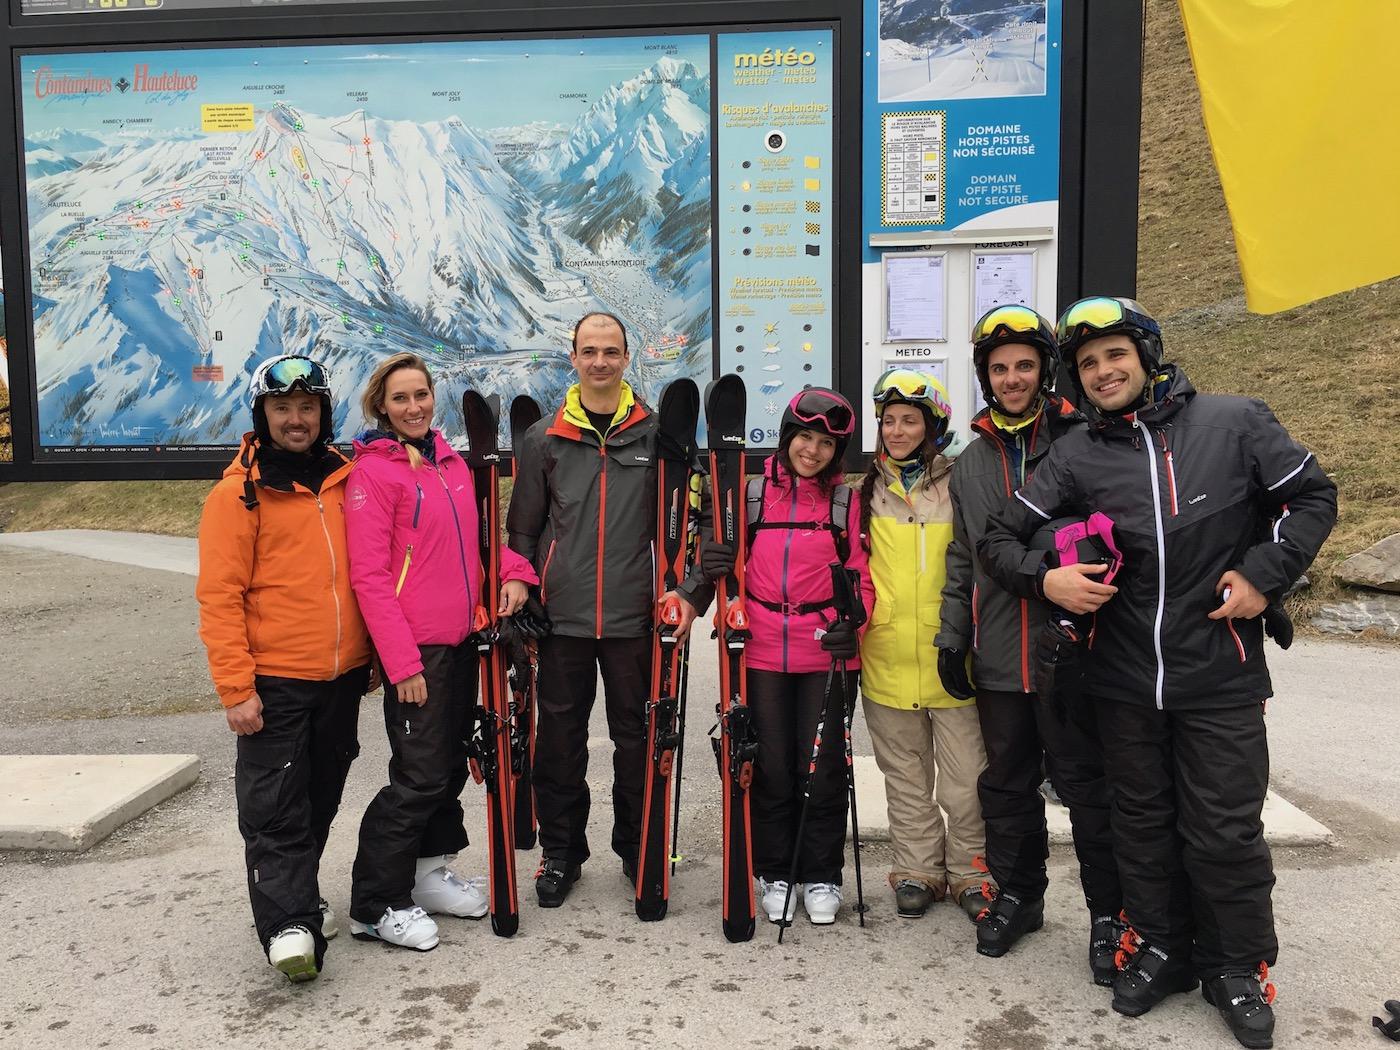 ski boost 300 archtec wedze